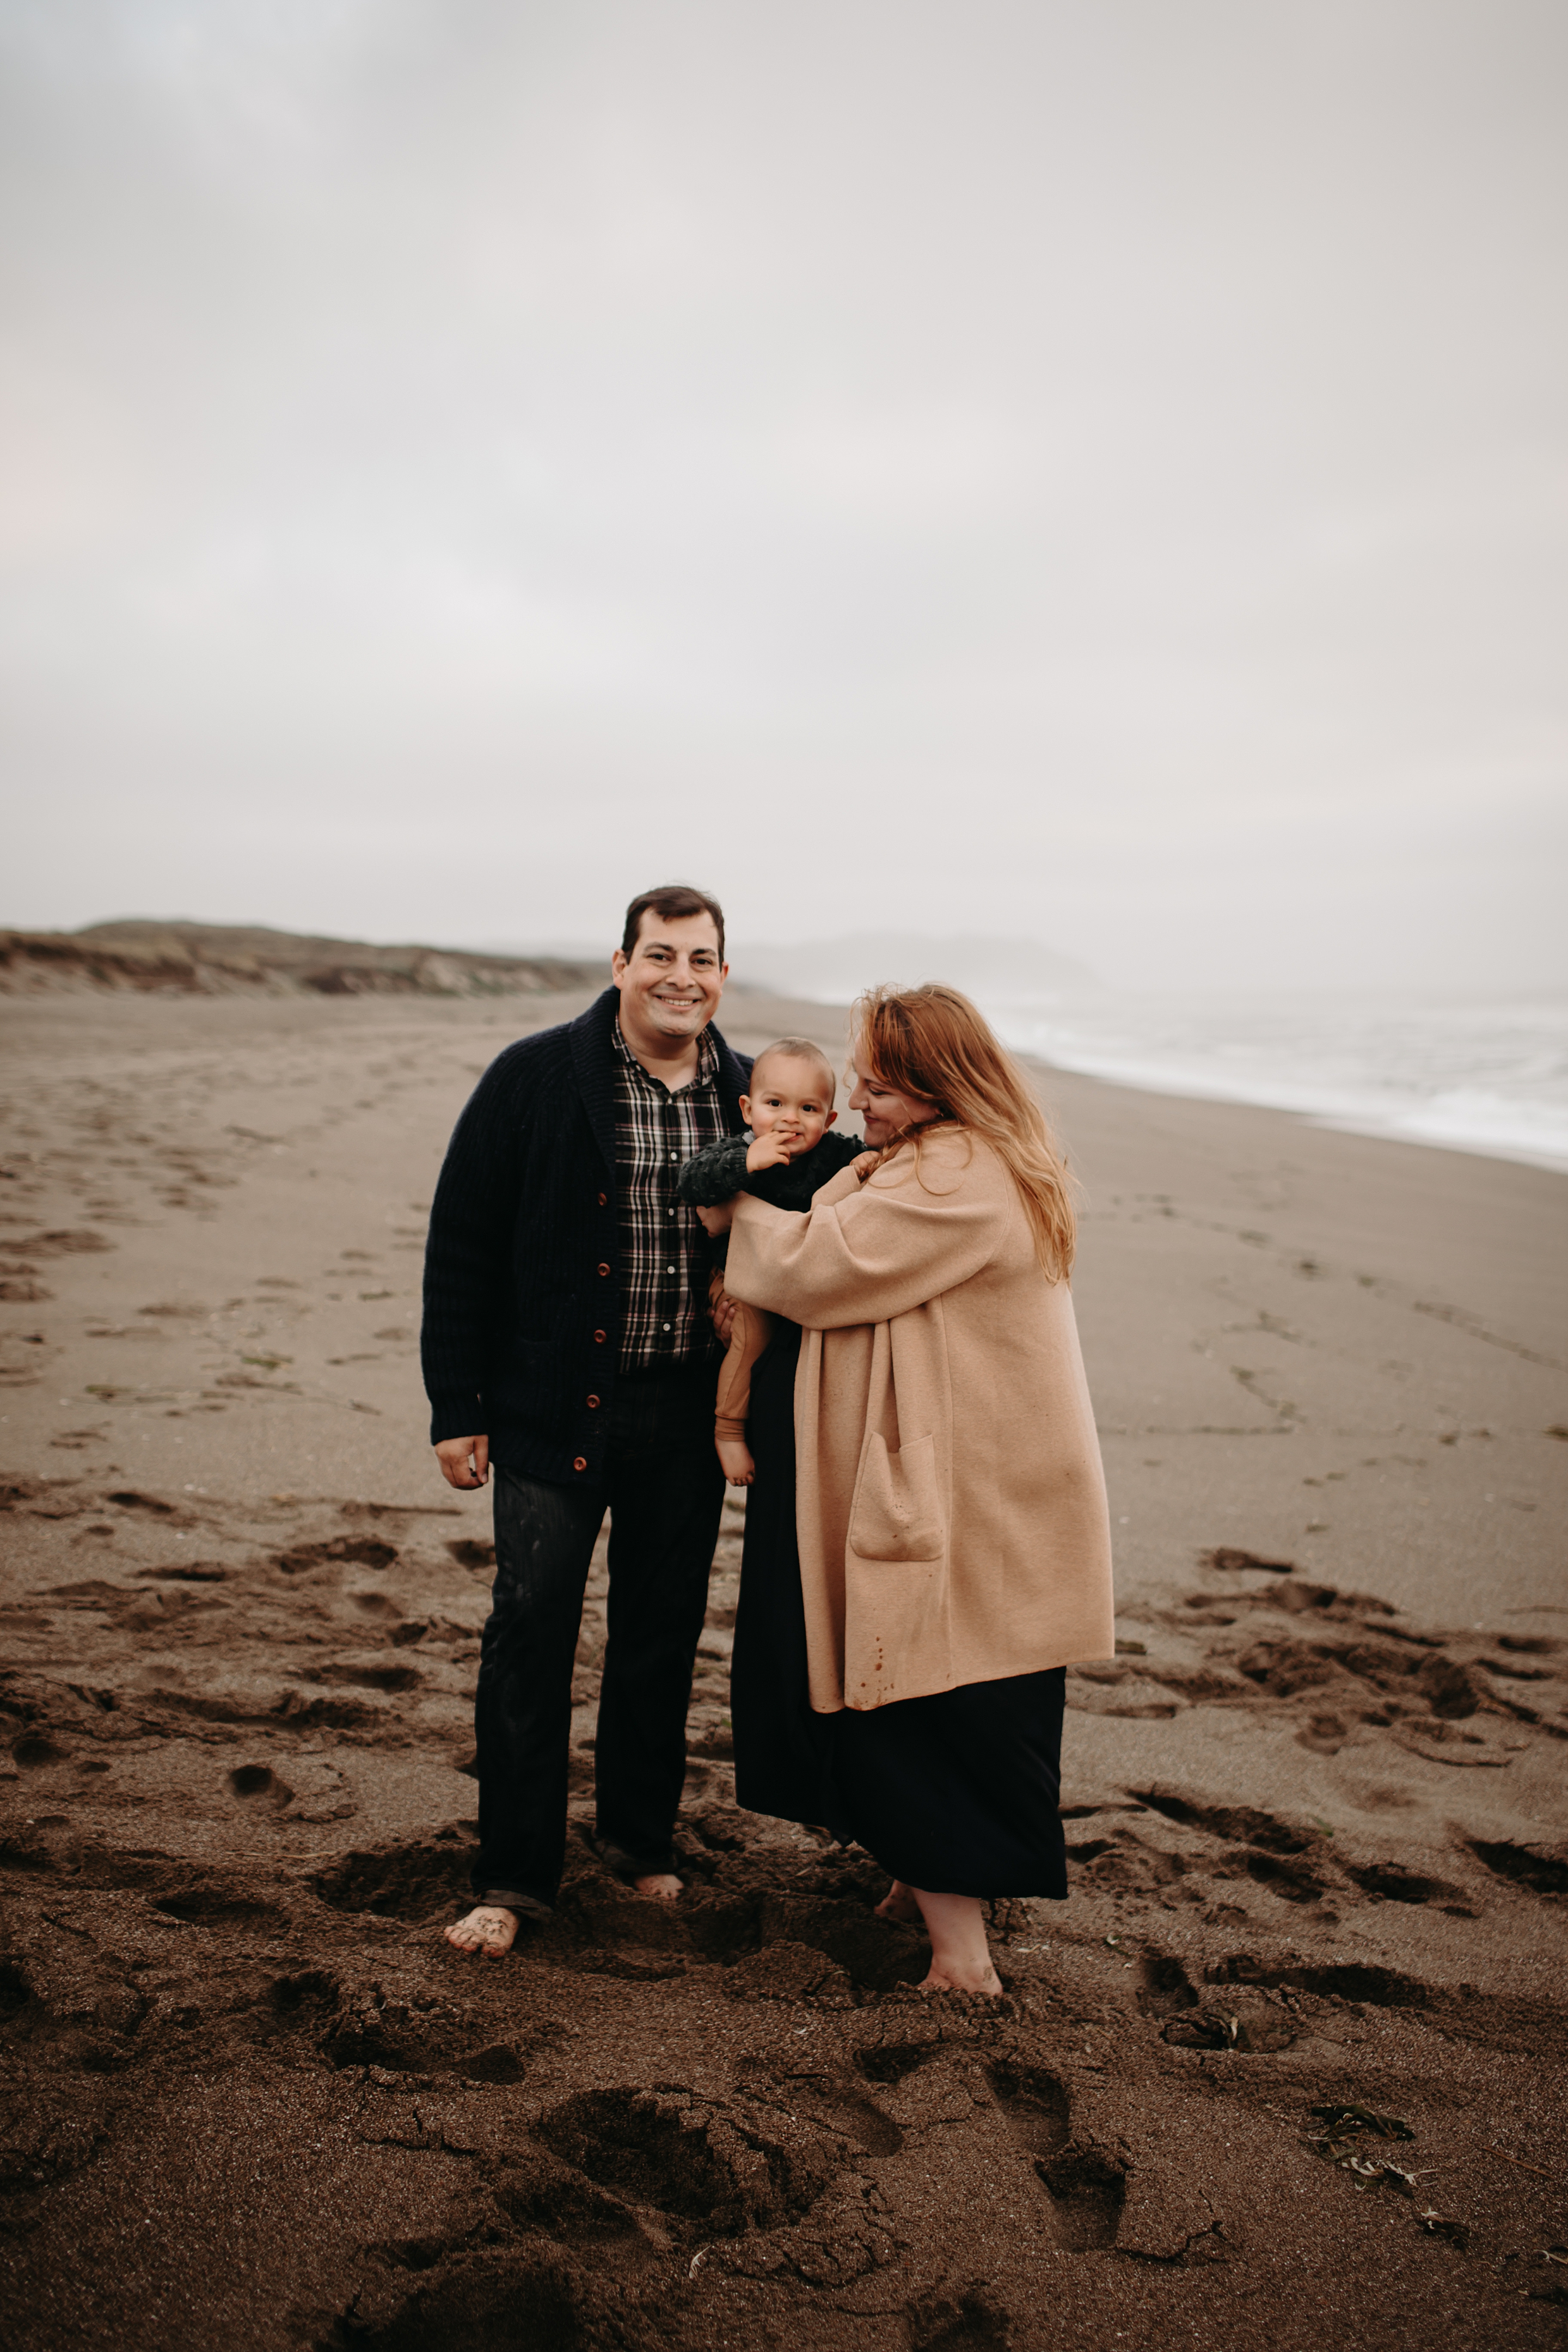 Laurel-San-Antonio-Family-Photographer-73_WEB.jpg